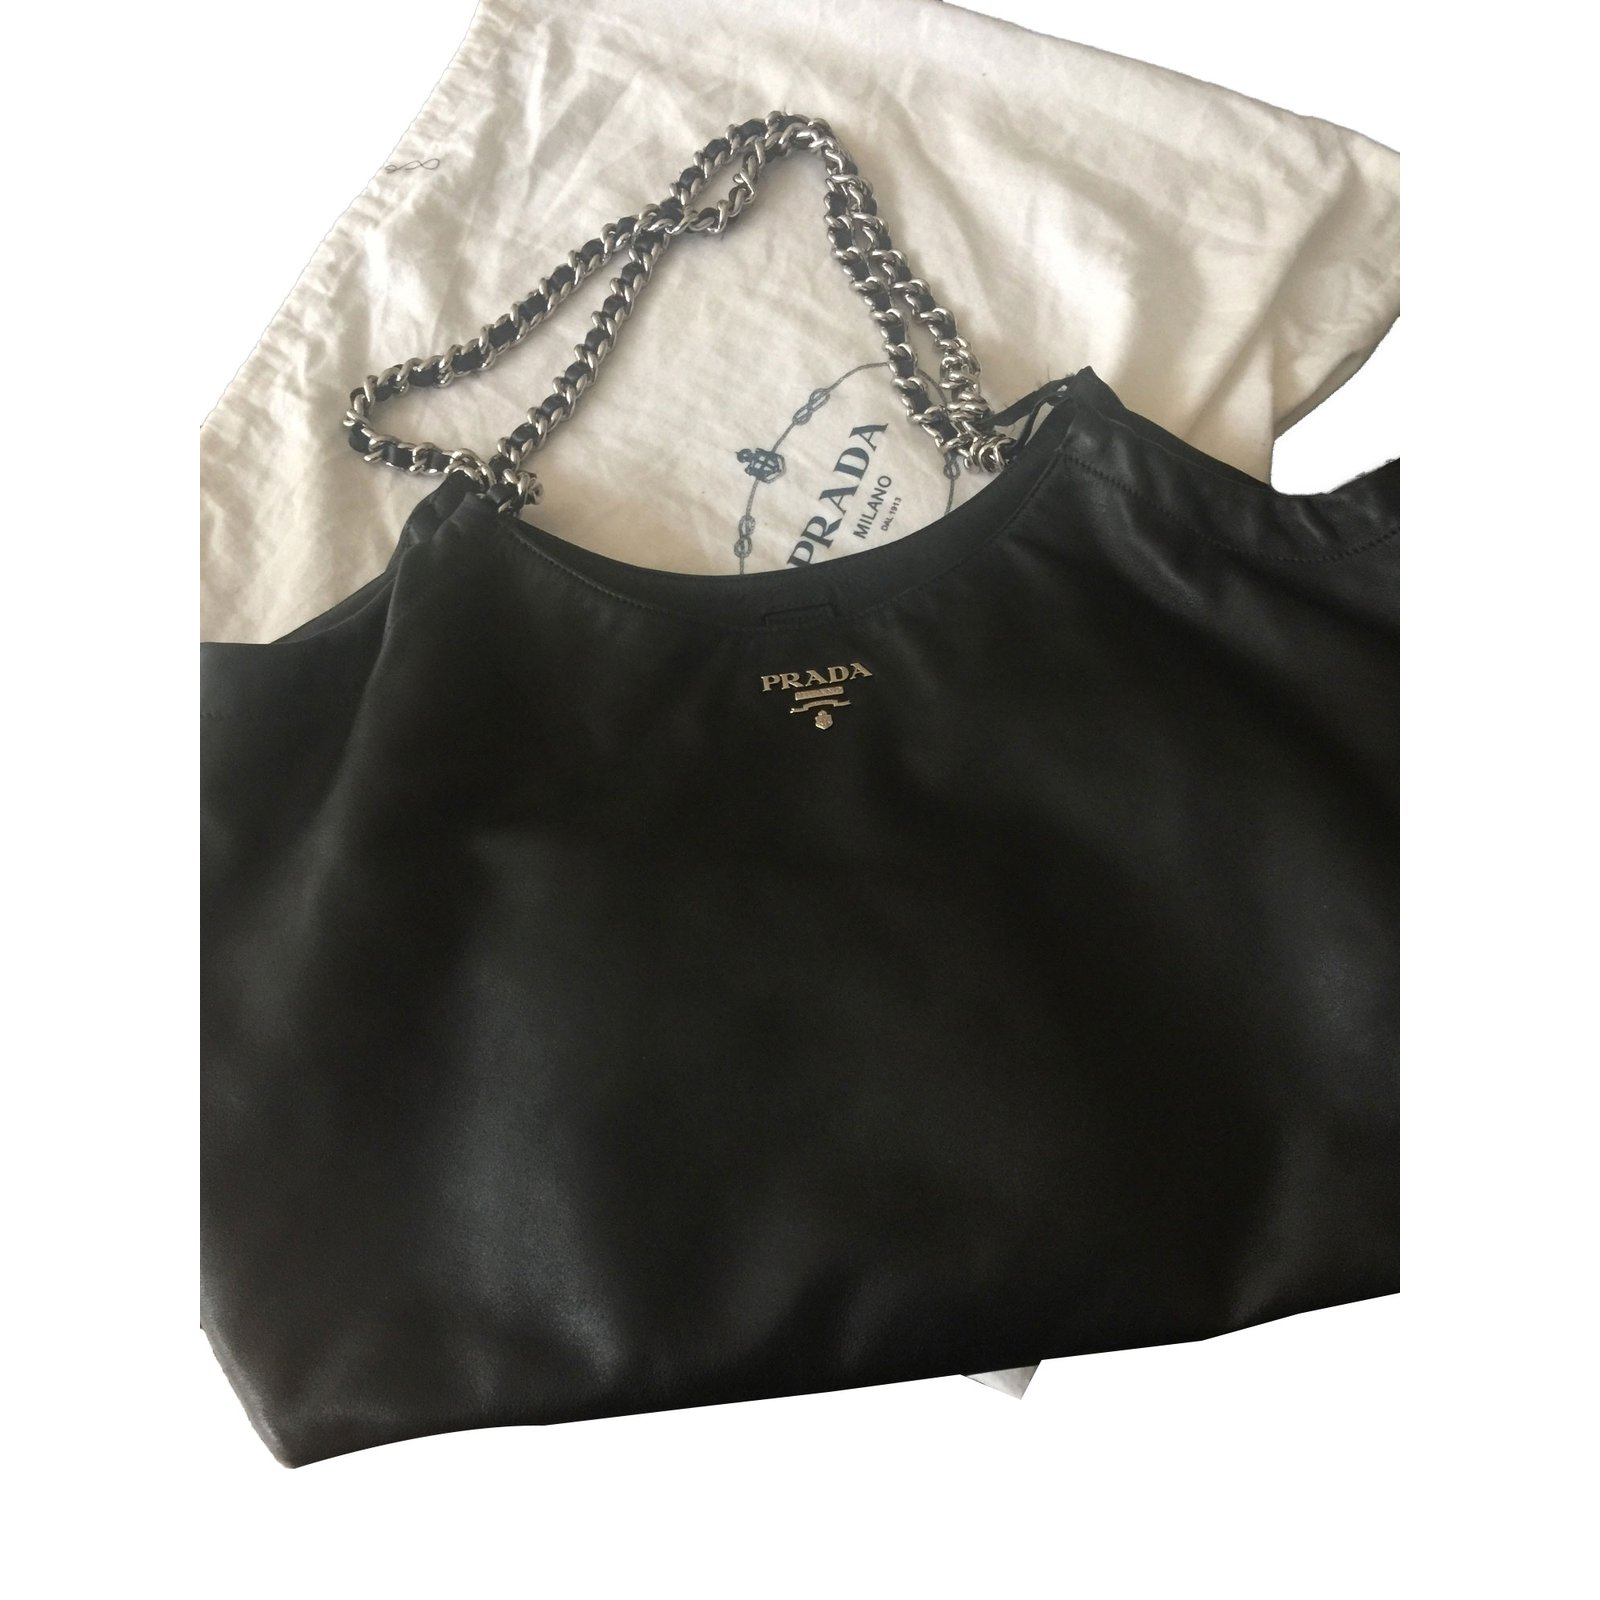 95dc83cee2c5 Prada Handbags Leather Black Ref 48043 Joli Closet. Prada Handbags. Prada  Leather Cahier Shoulder Bag